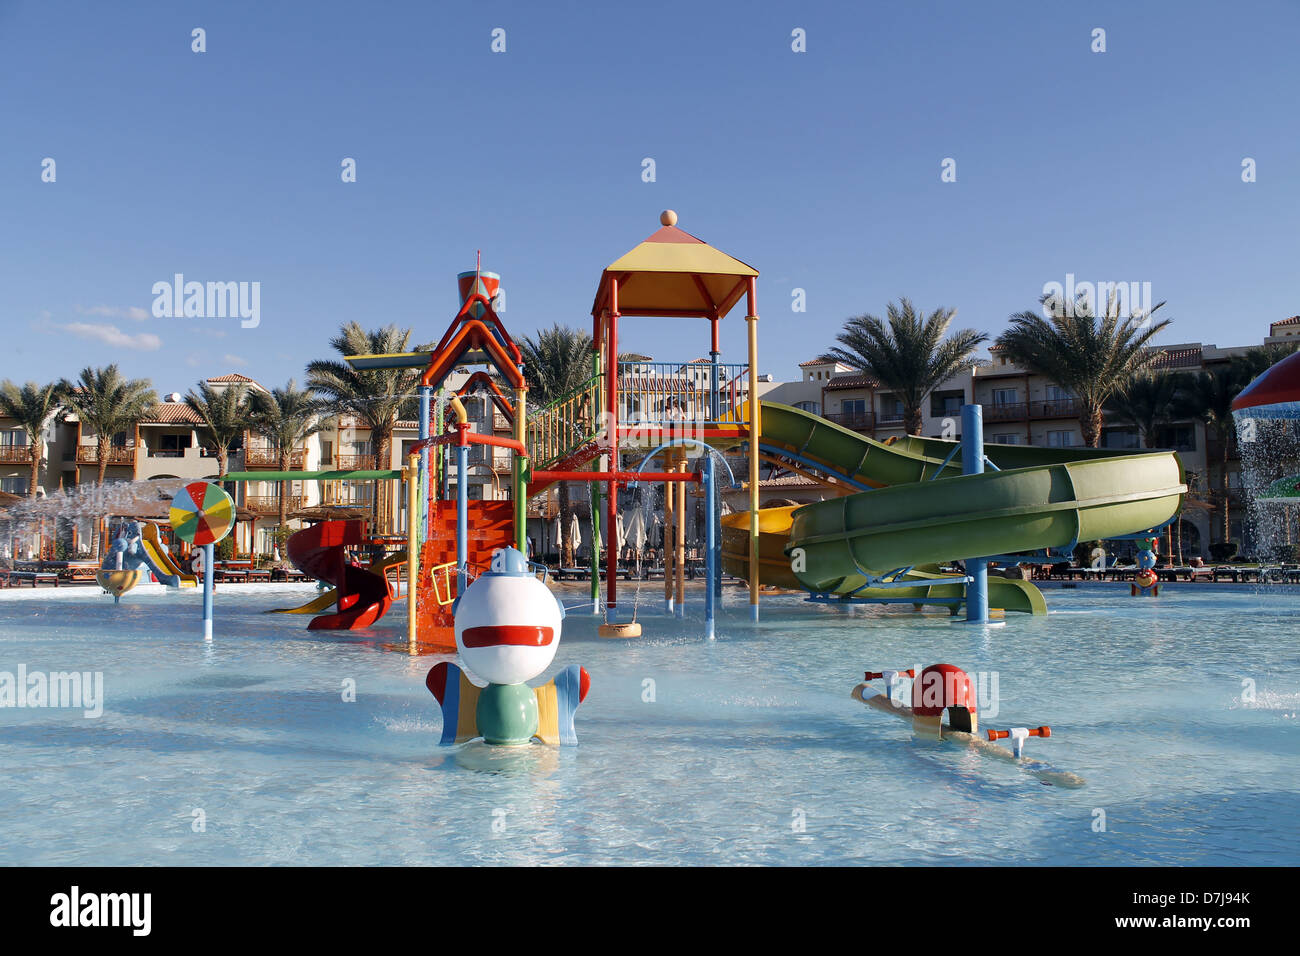 Childrens Swimming Pool Fountains Dana Beach Hotel Hurghada Egypt Stock Photo Alamy